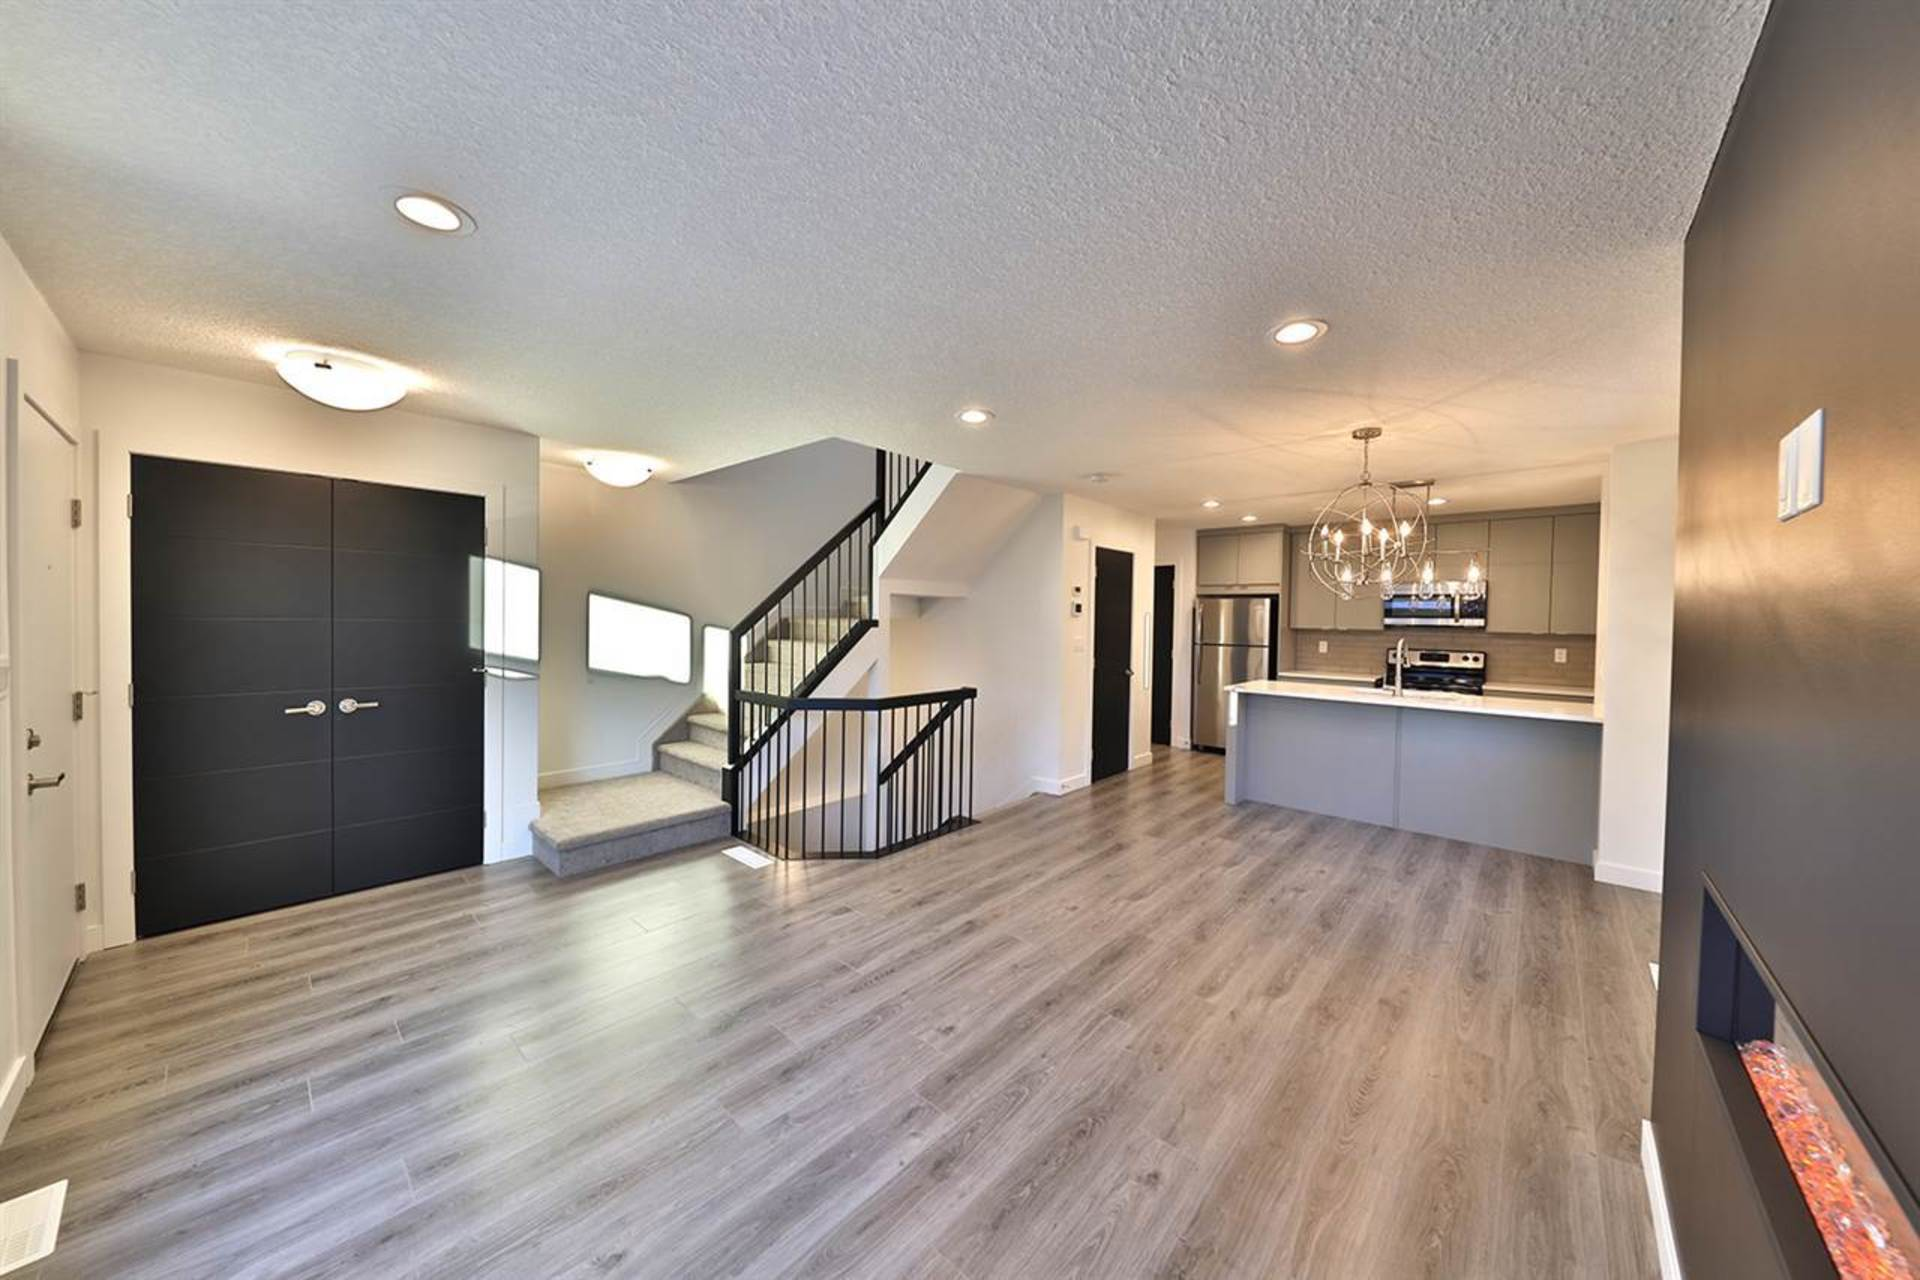 11638-84-street-parkdale_edmo-edmonton-06 at 11638 84 Street, Parkdale_EDMO, Edmonton